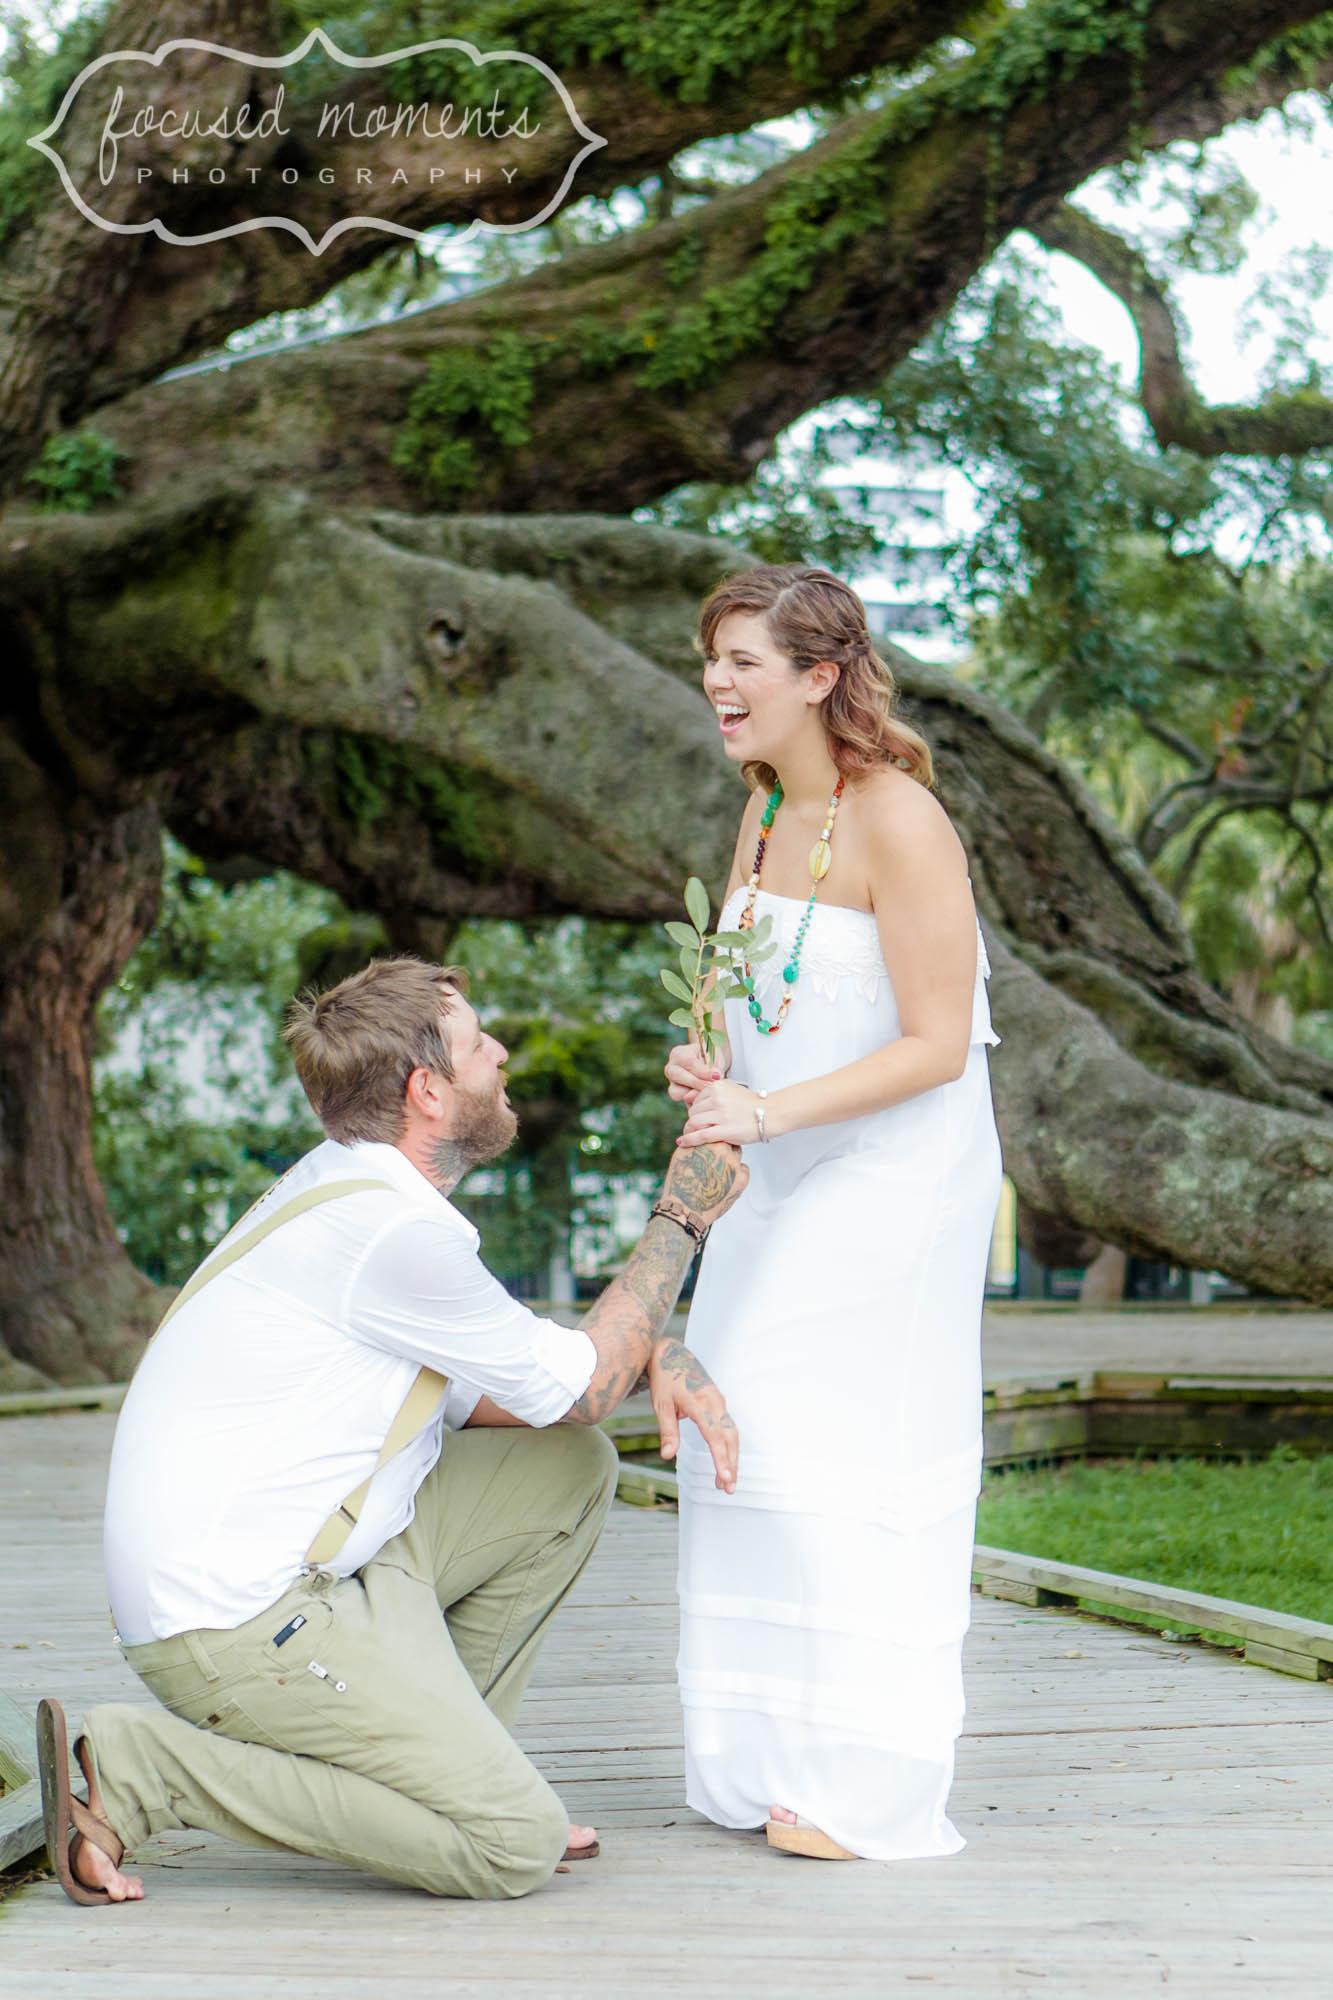 2013_08_03_Treaty_Oaks_Park_Jacksonville_Engagement_Photography_21.jpg